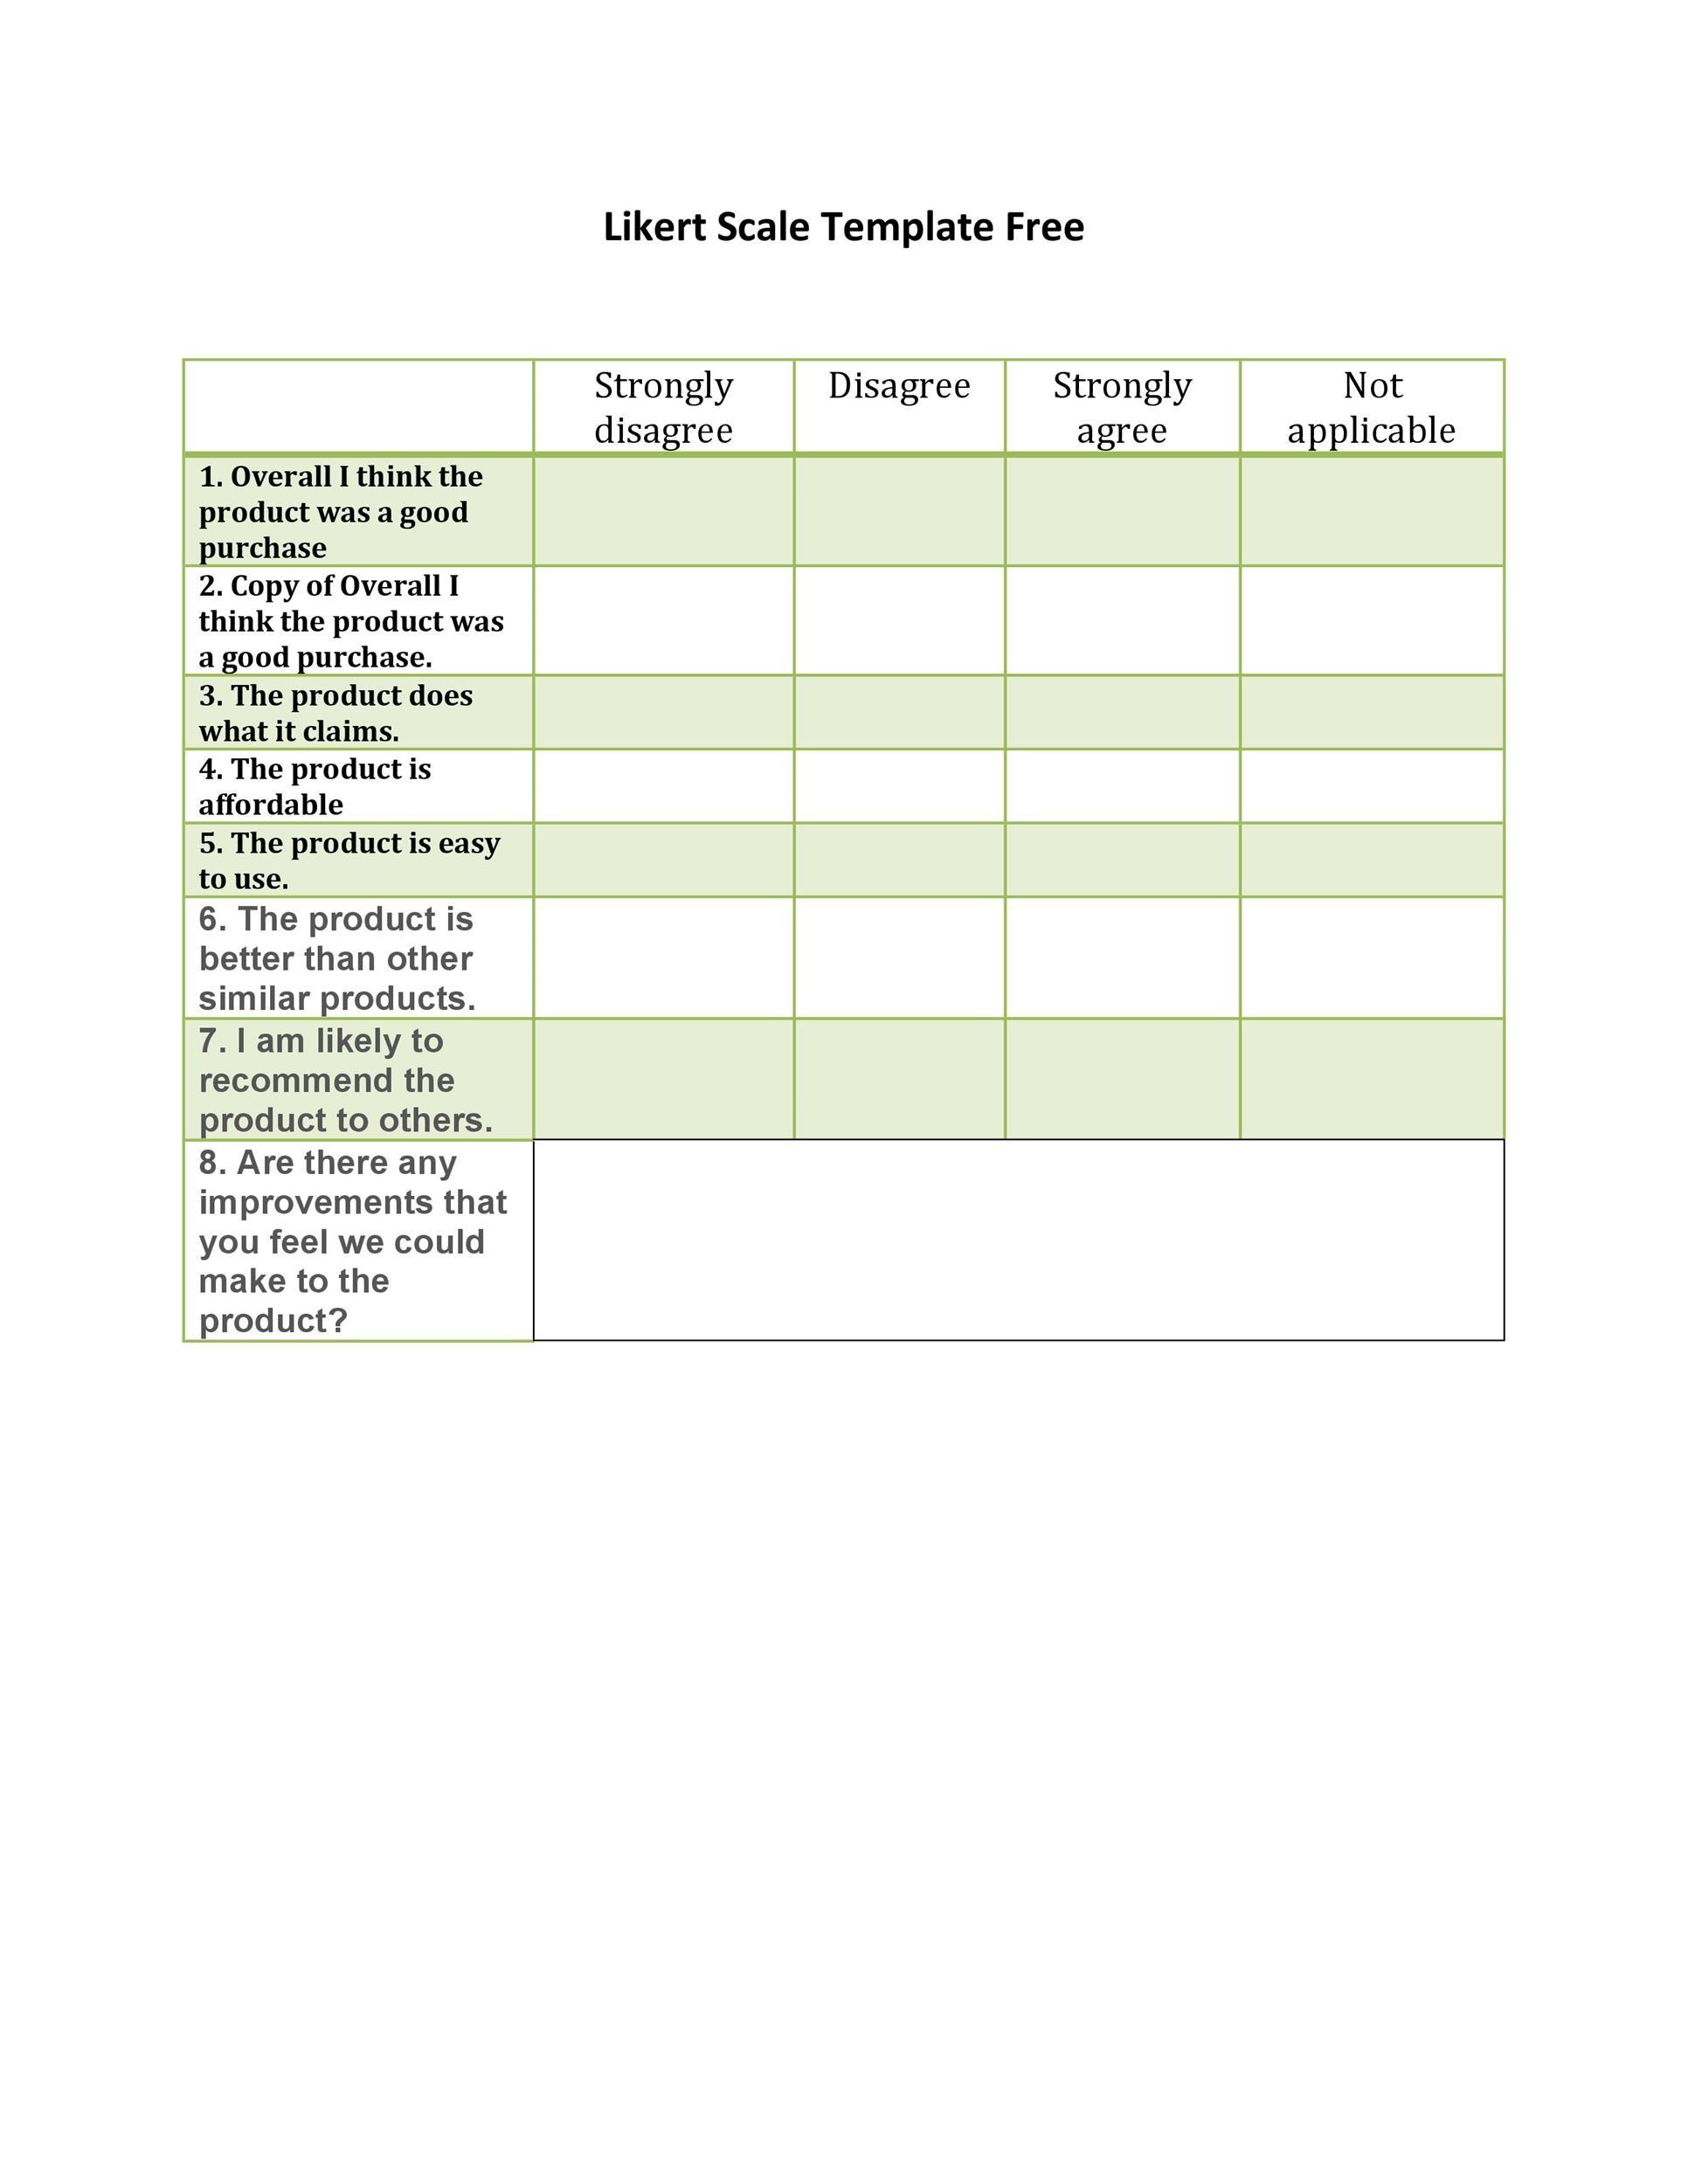 Free Likert Scale 04